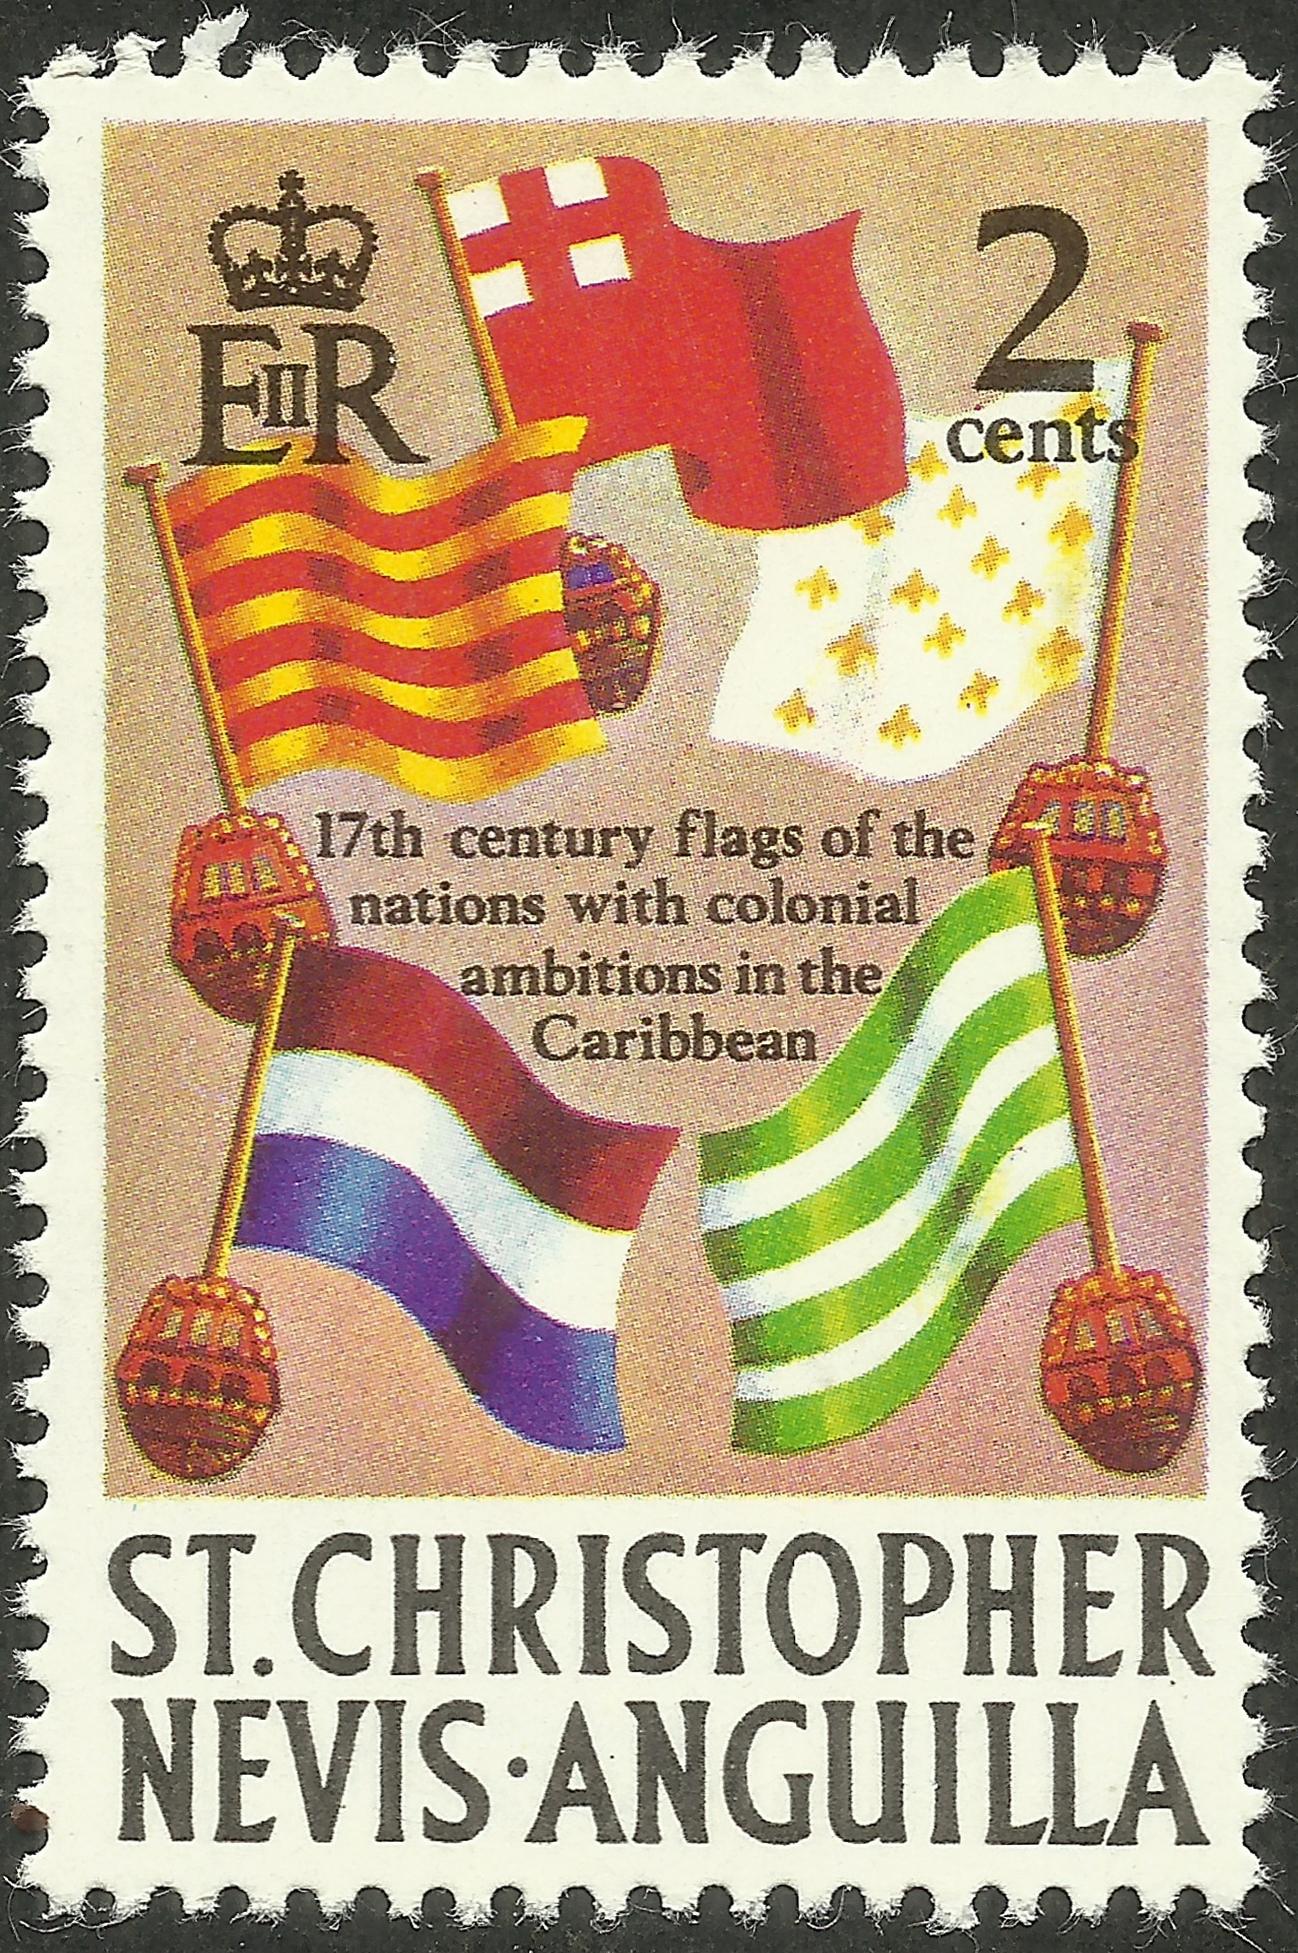 St. Christopher-Nevis-Anguilla - Scott #208 (1970)